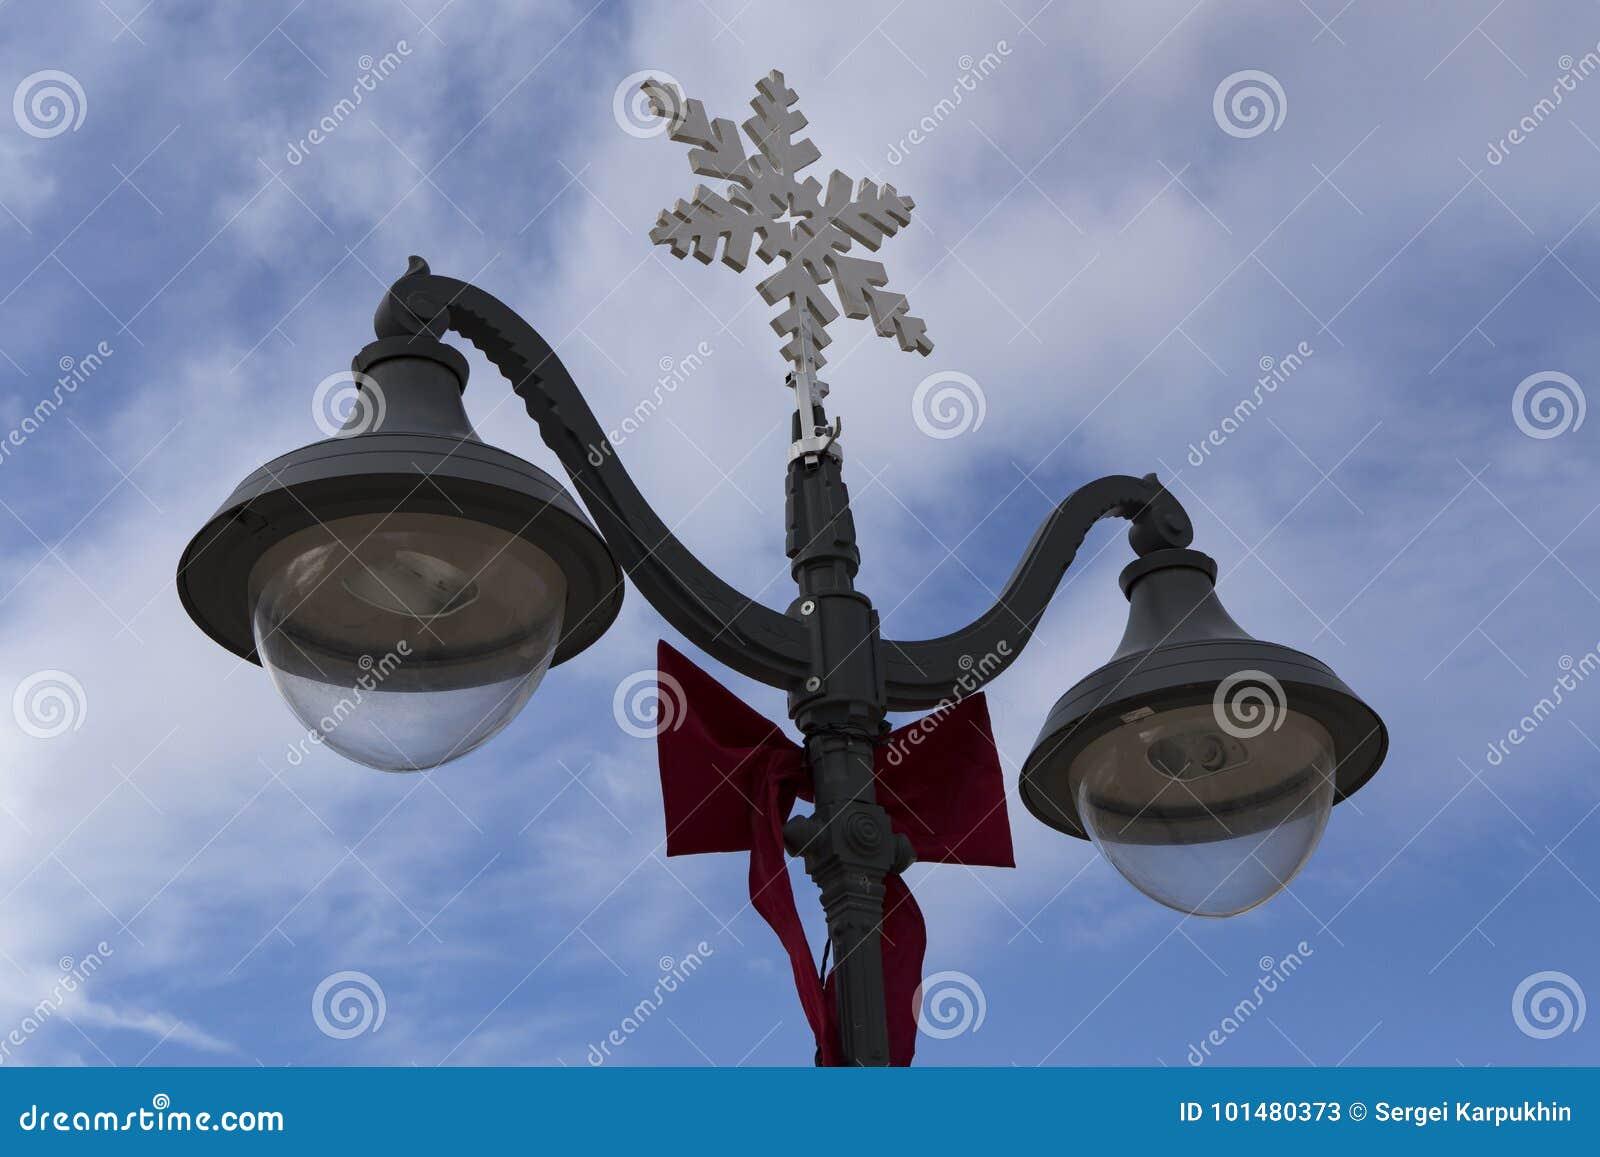 Street Lamp With Christmas Symbols Stock Image Image Of Snowflake